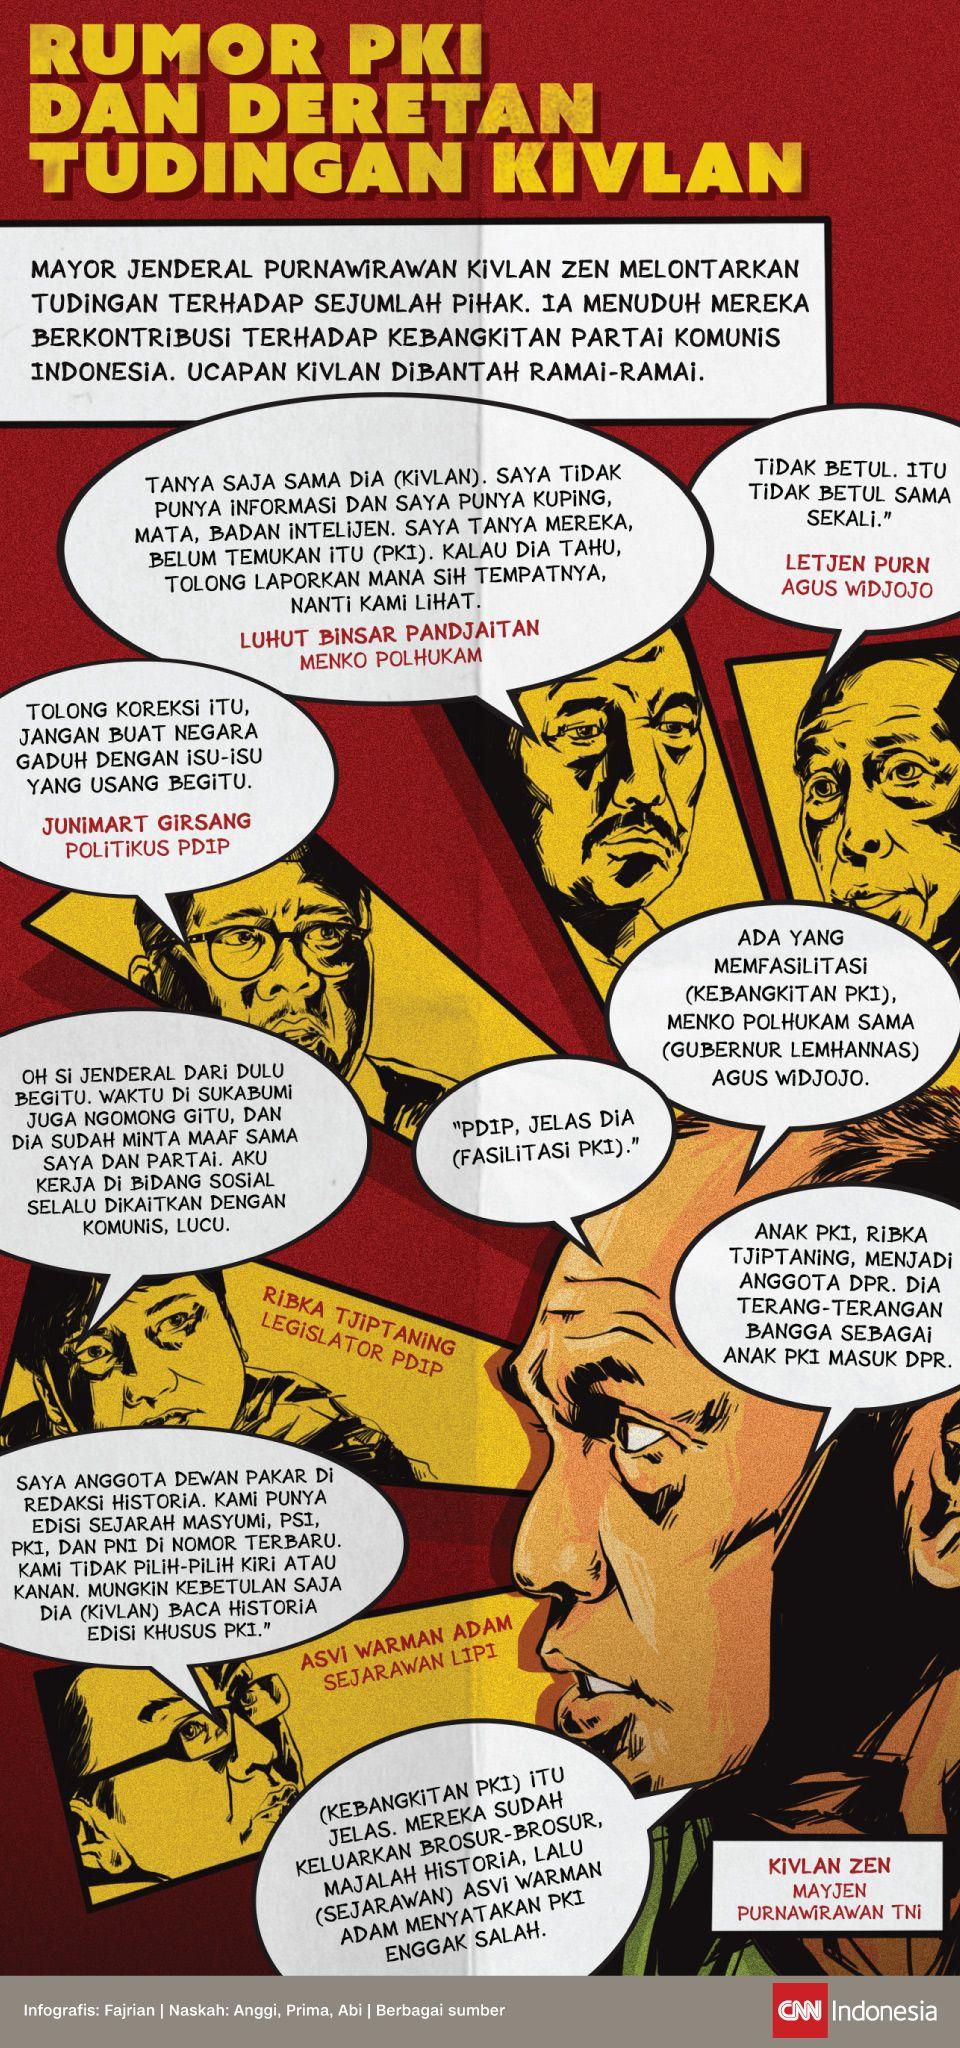 Infografis Rumor PKI dan Deretan Tudingan Kivlan